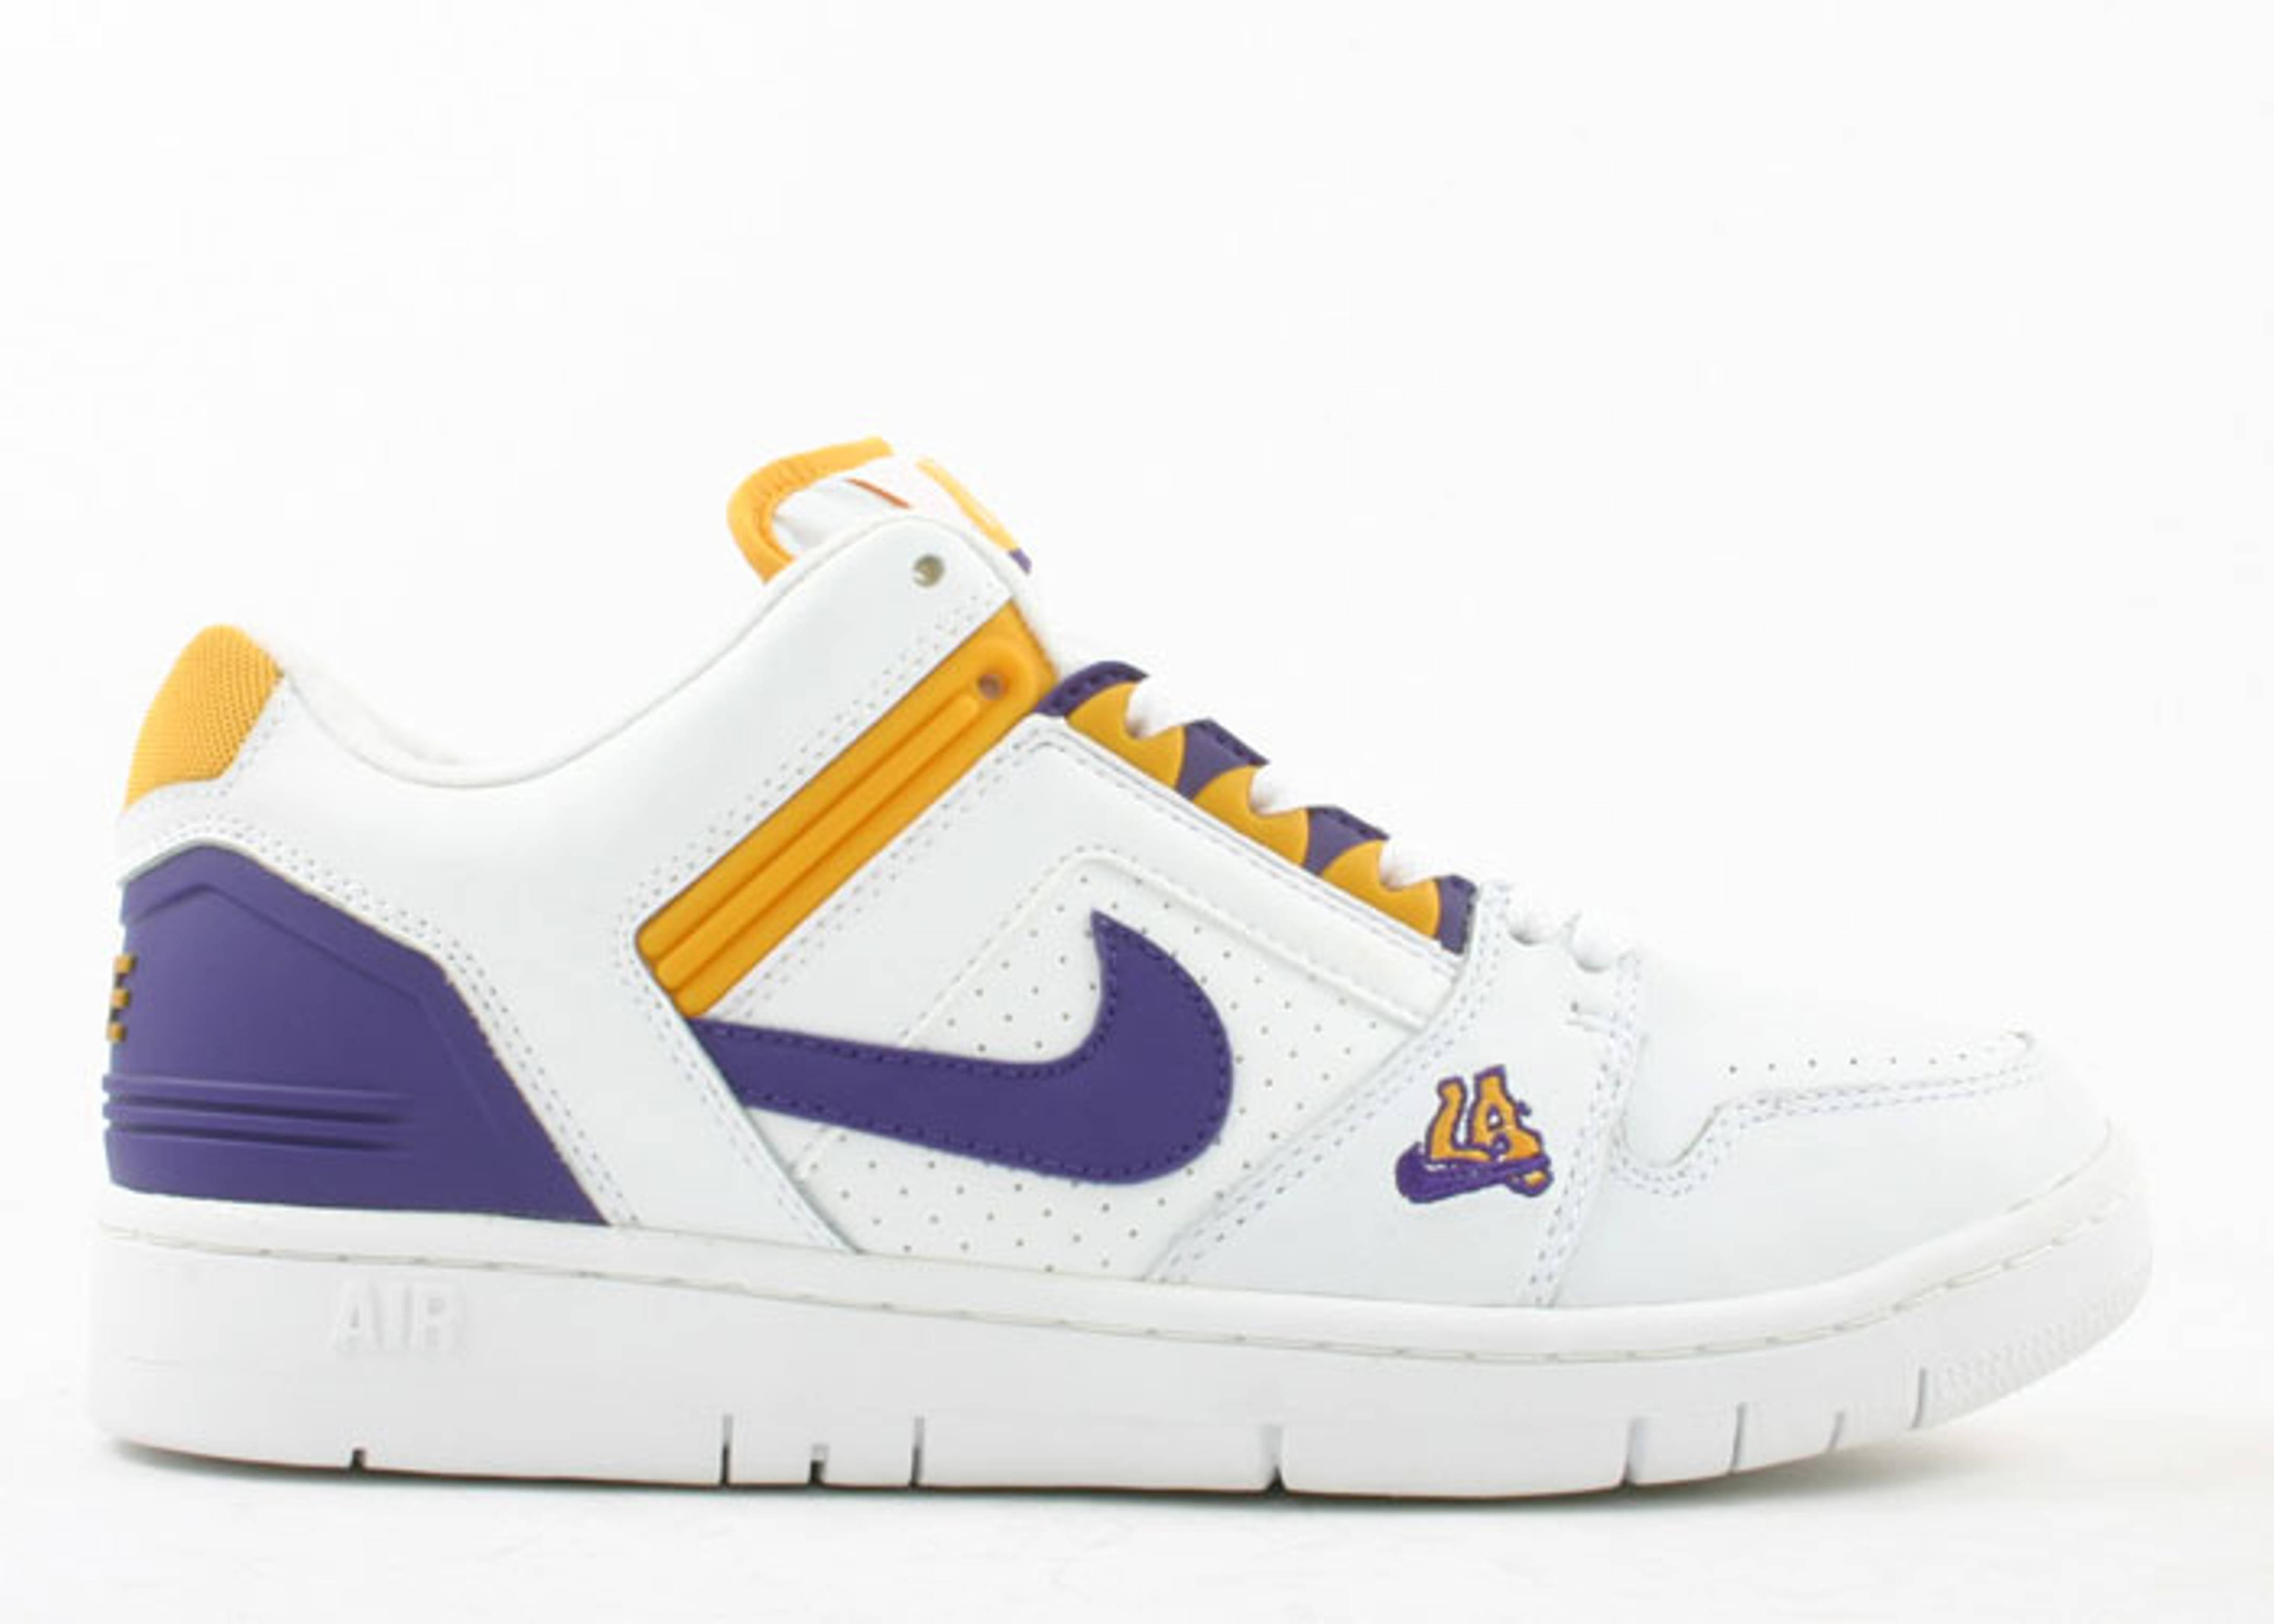 Nike Air Force 1 Low LE QS WhiteCourt Purple | Nike | Sole